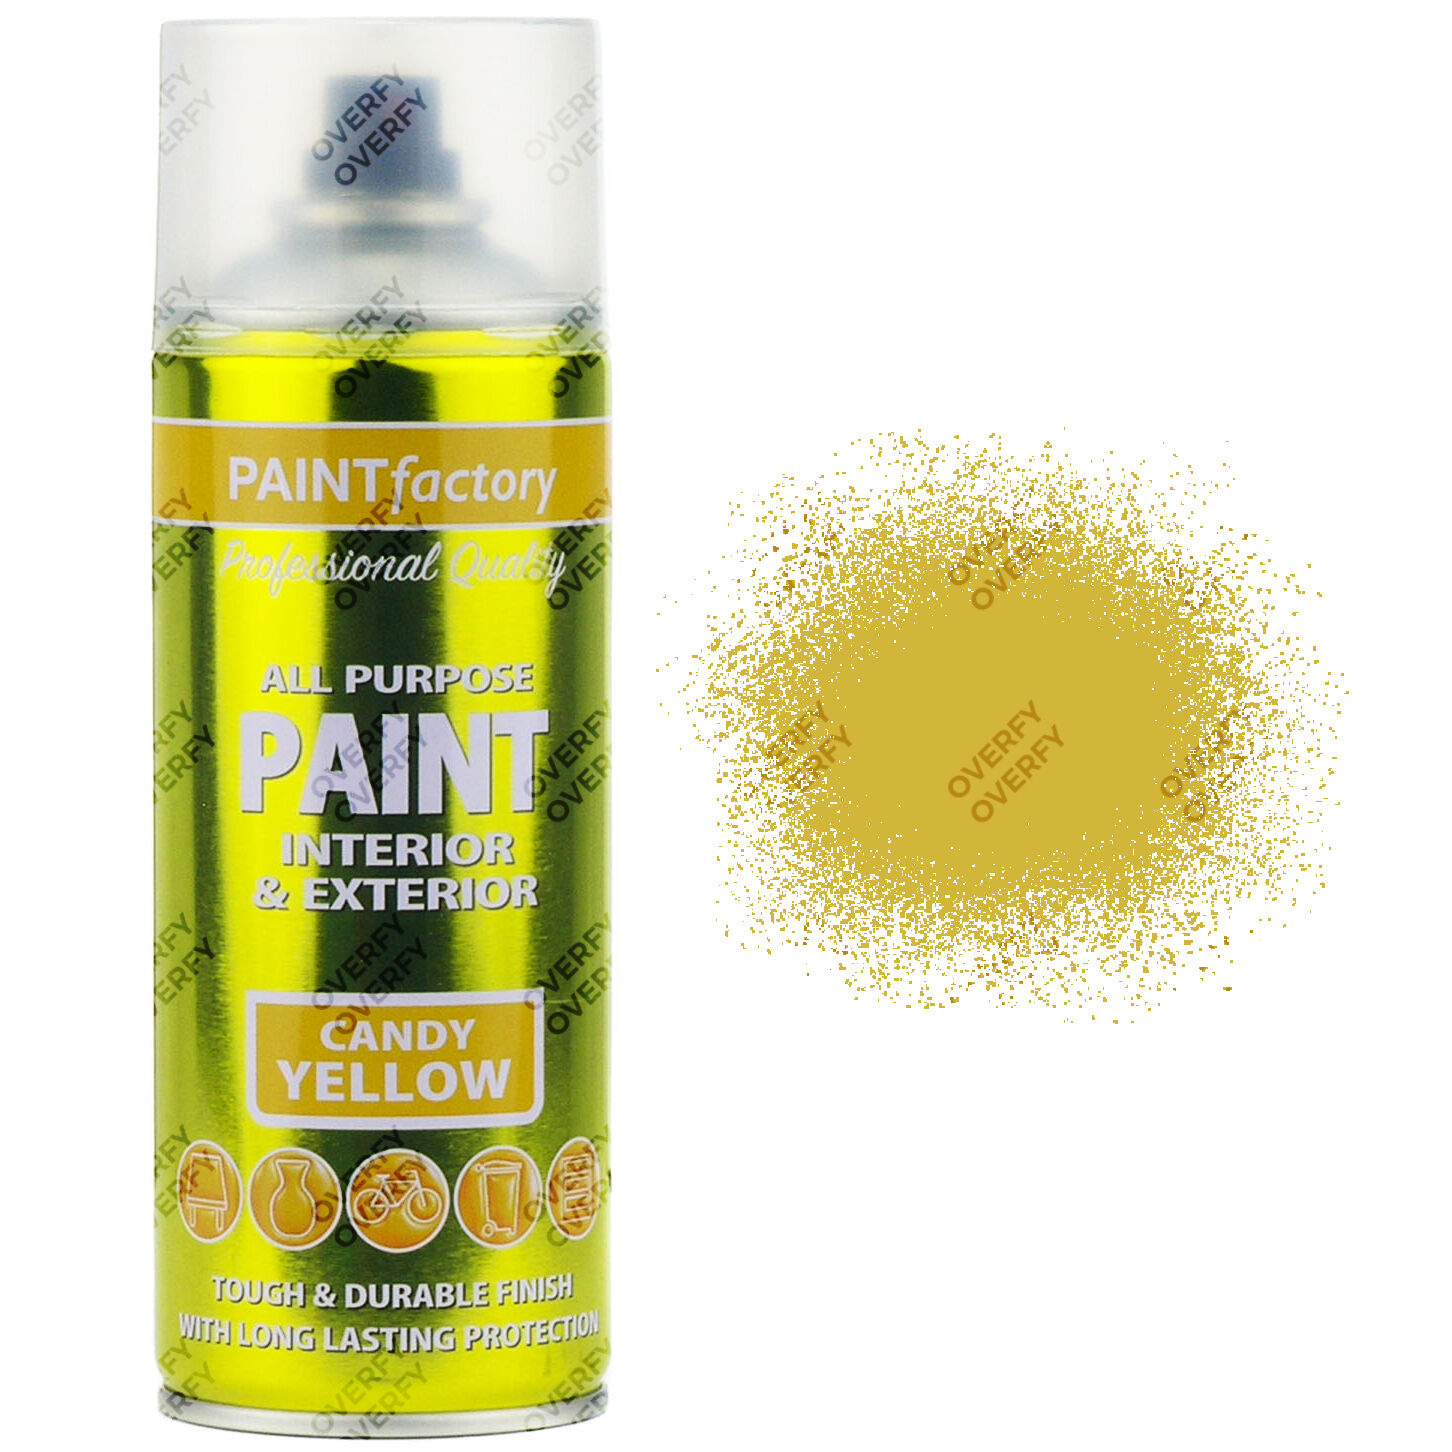 Delightful Candy Yellow Spray Paint Part - 2: 400ml All Purpose Candy Yellow Aerosol Spray Paint Household Car Plastic Etc